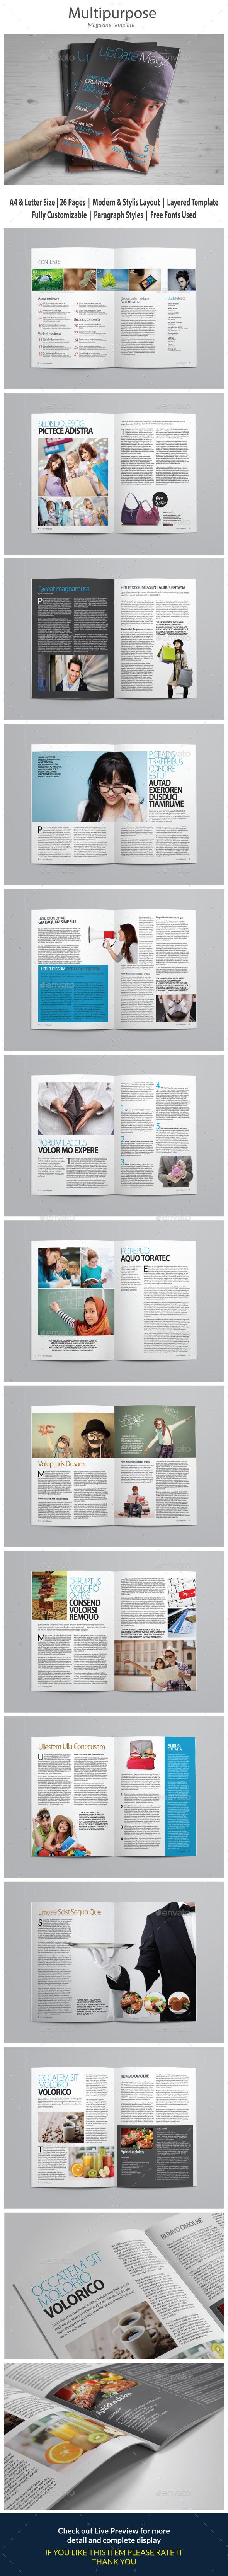 Indesign Magazine Template vol 2 - Magazines Print Templates